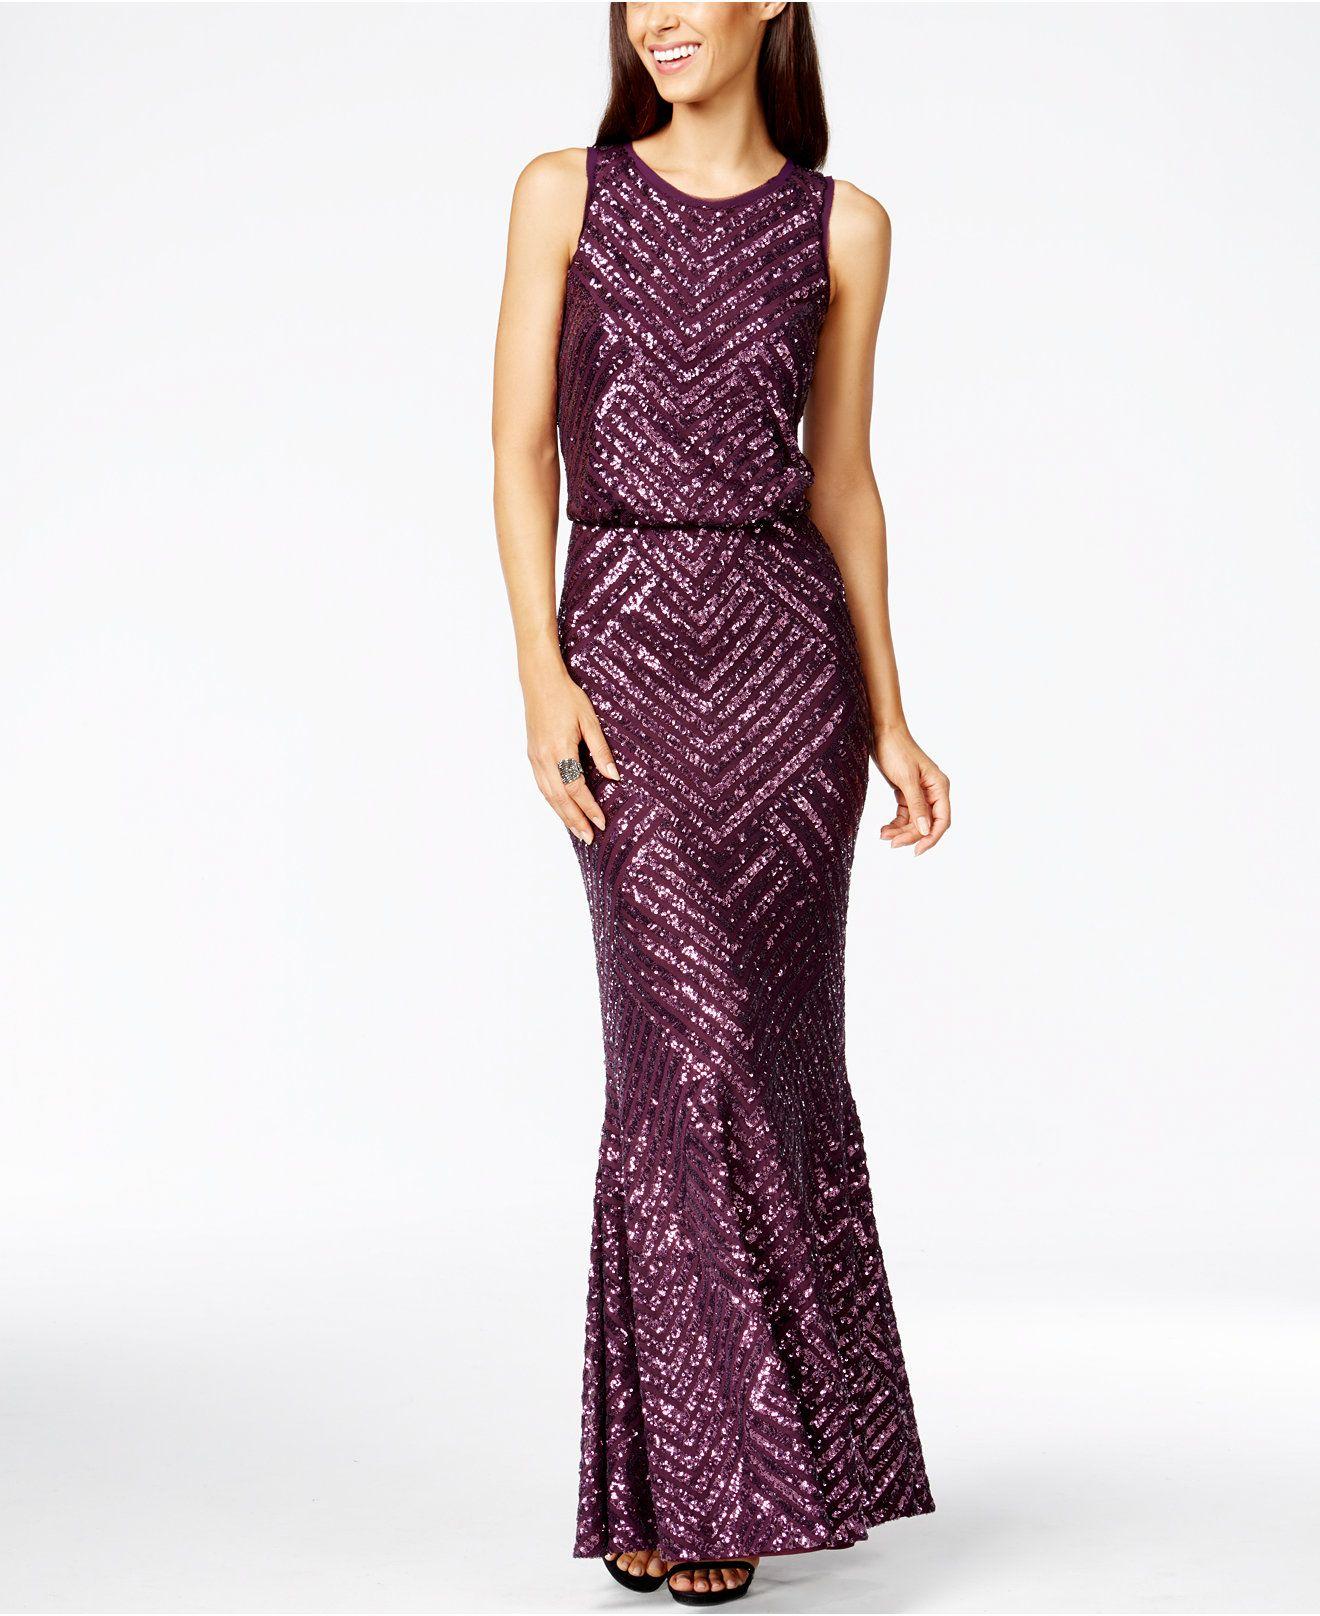 Calvin Klein Sequin Open-Back Mermaid Gown - Dresses - Women ...